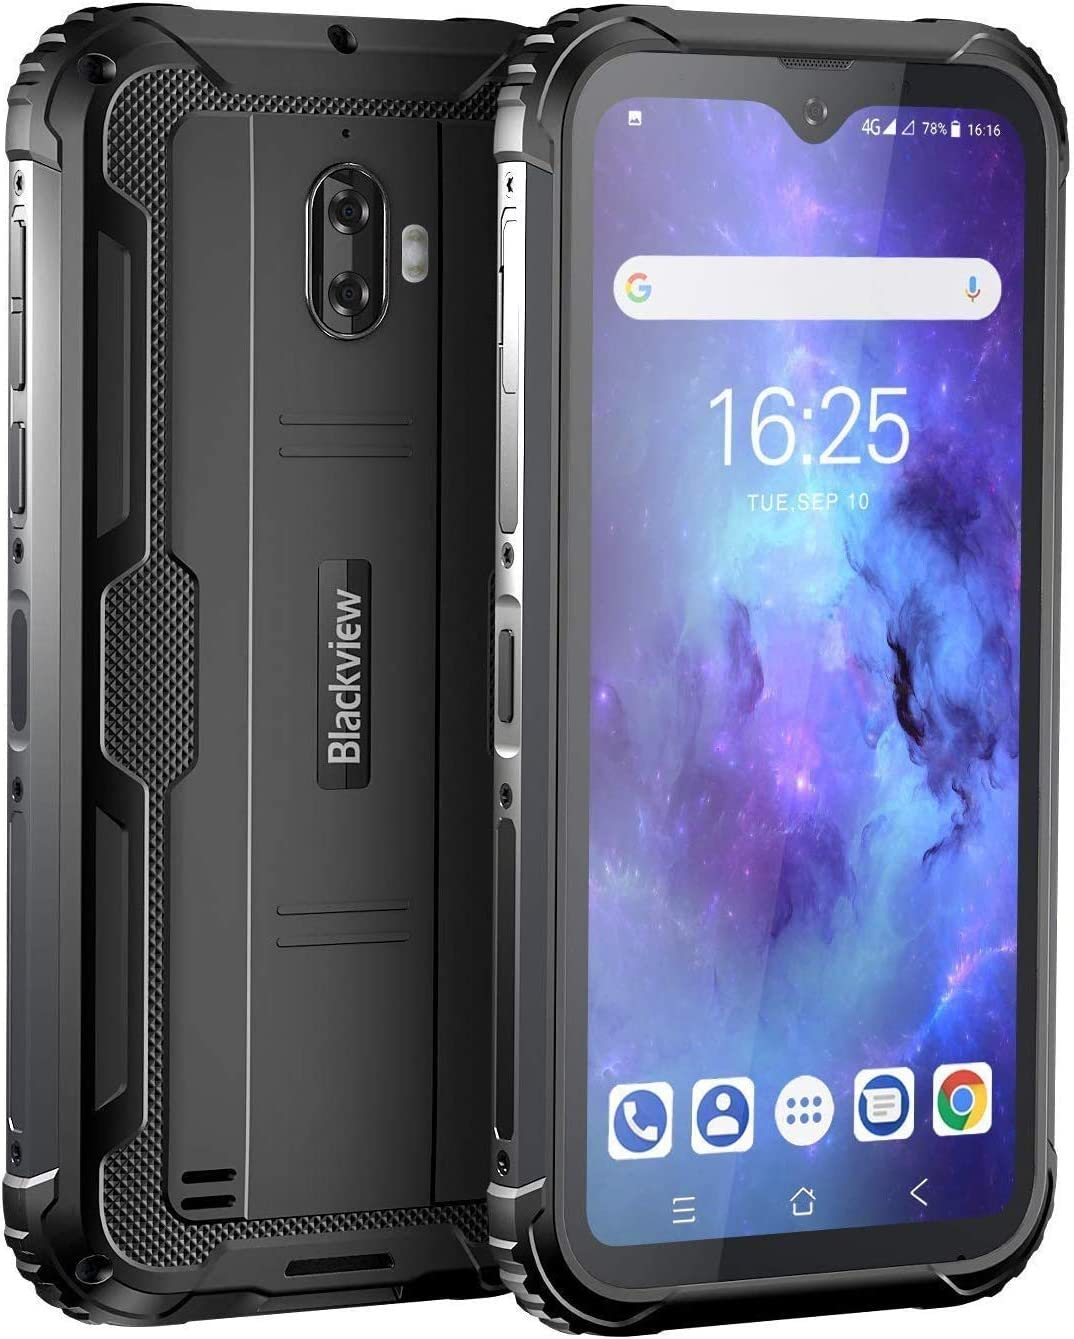 Movil Resistente 4G, Blackview BV5900 Telefono Movil Antigolpes(2020), Batería 5580mAh, 5.7 Pulgadas HD+, 32GB+ 3GB, IP68 Impermeable Smartphone, 13MP+5MP, Android 9.0, Dual SIM/GPS/NFC/Face ID